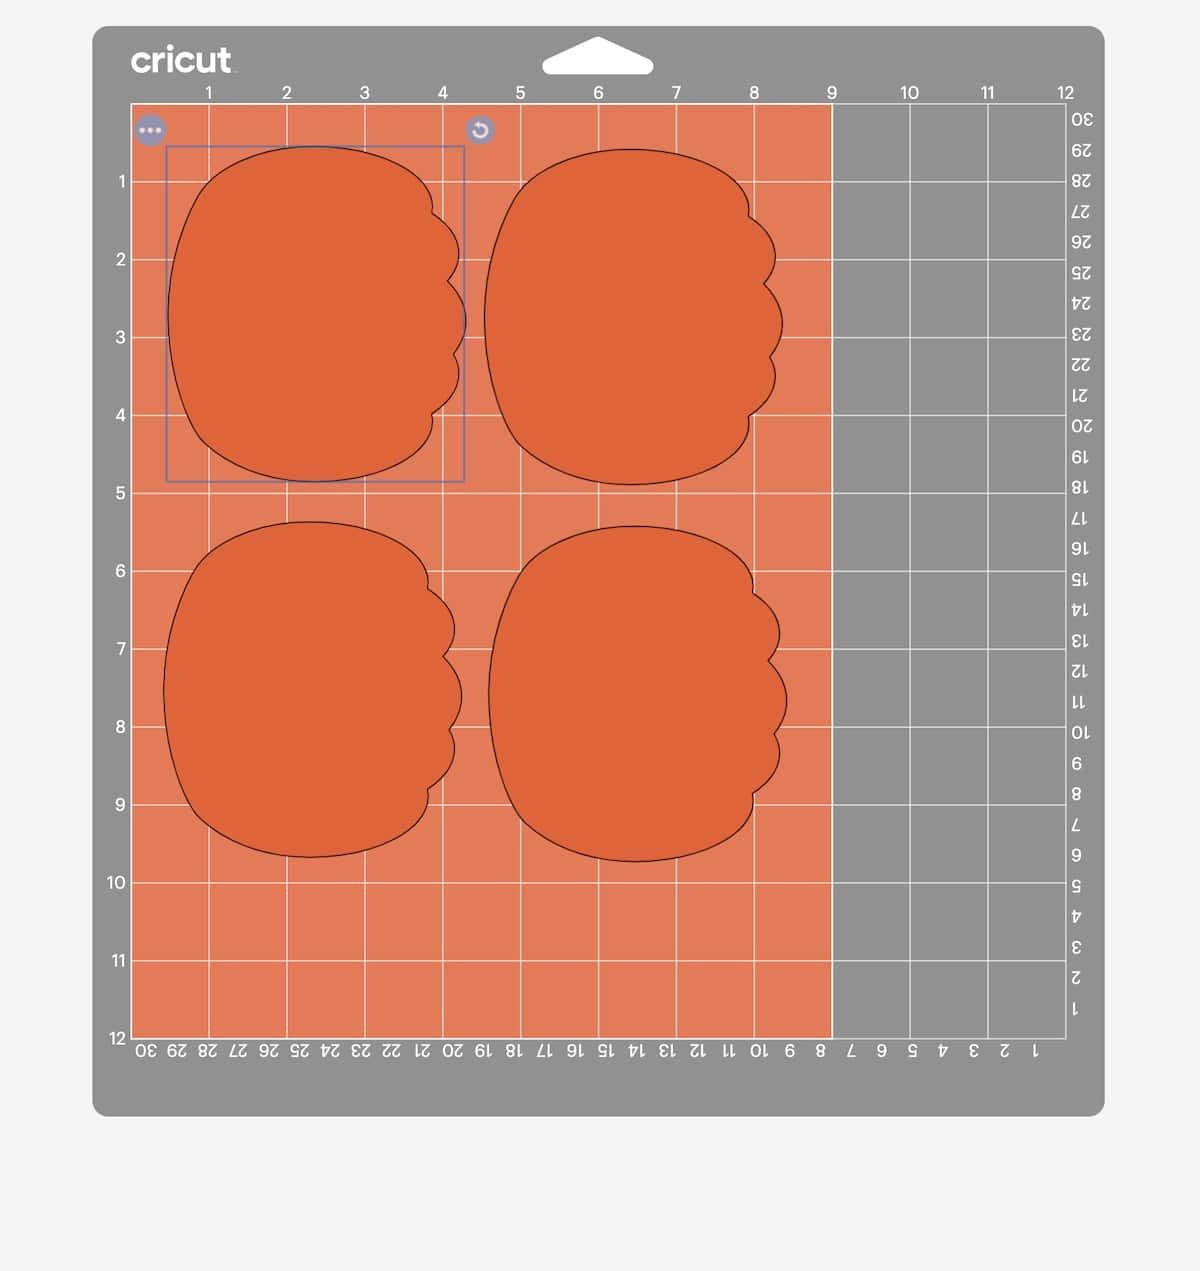 screenshot of cricut design space cutting pumpkins